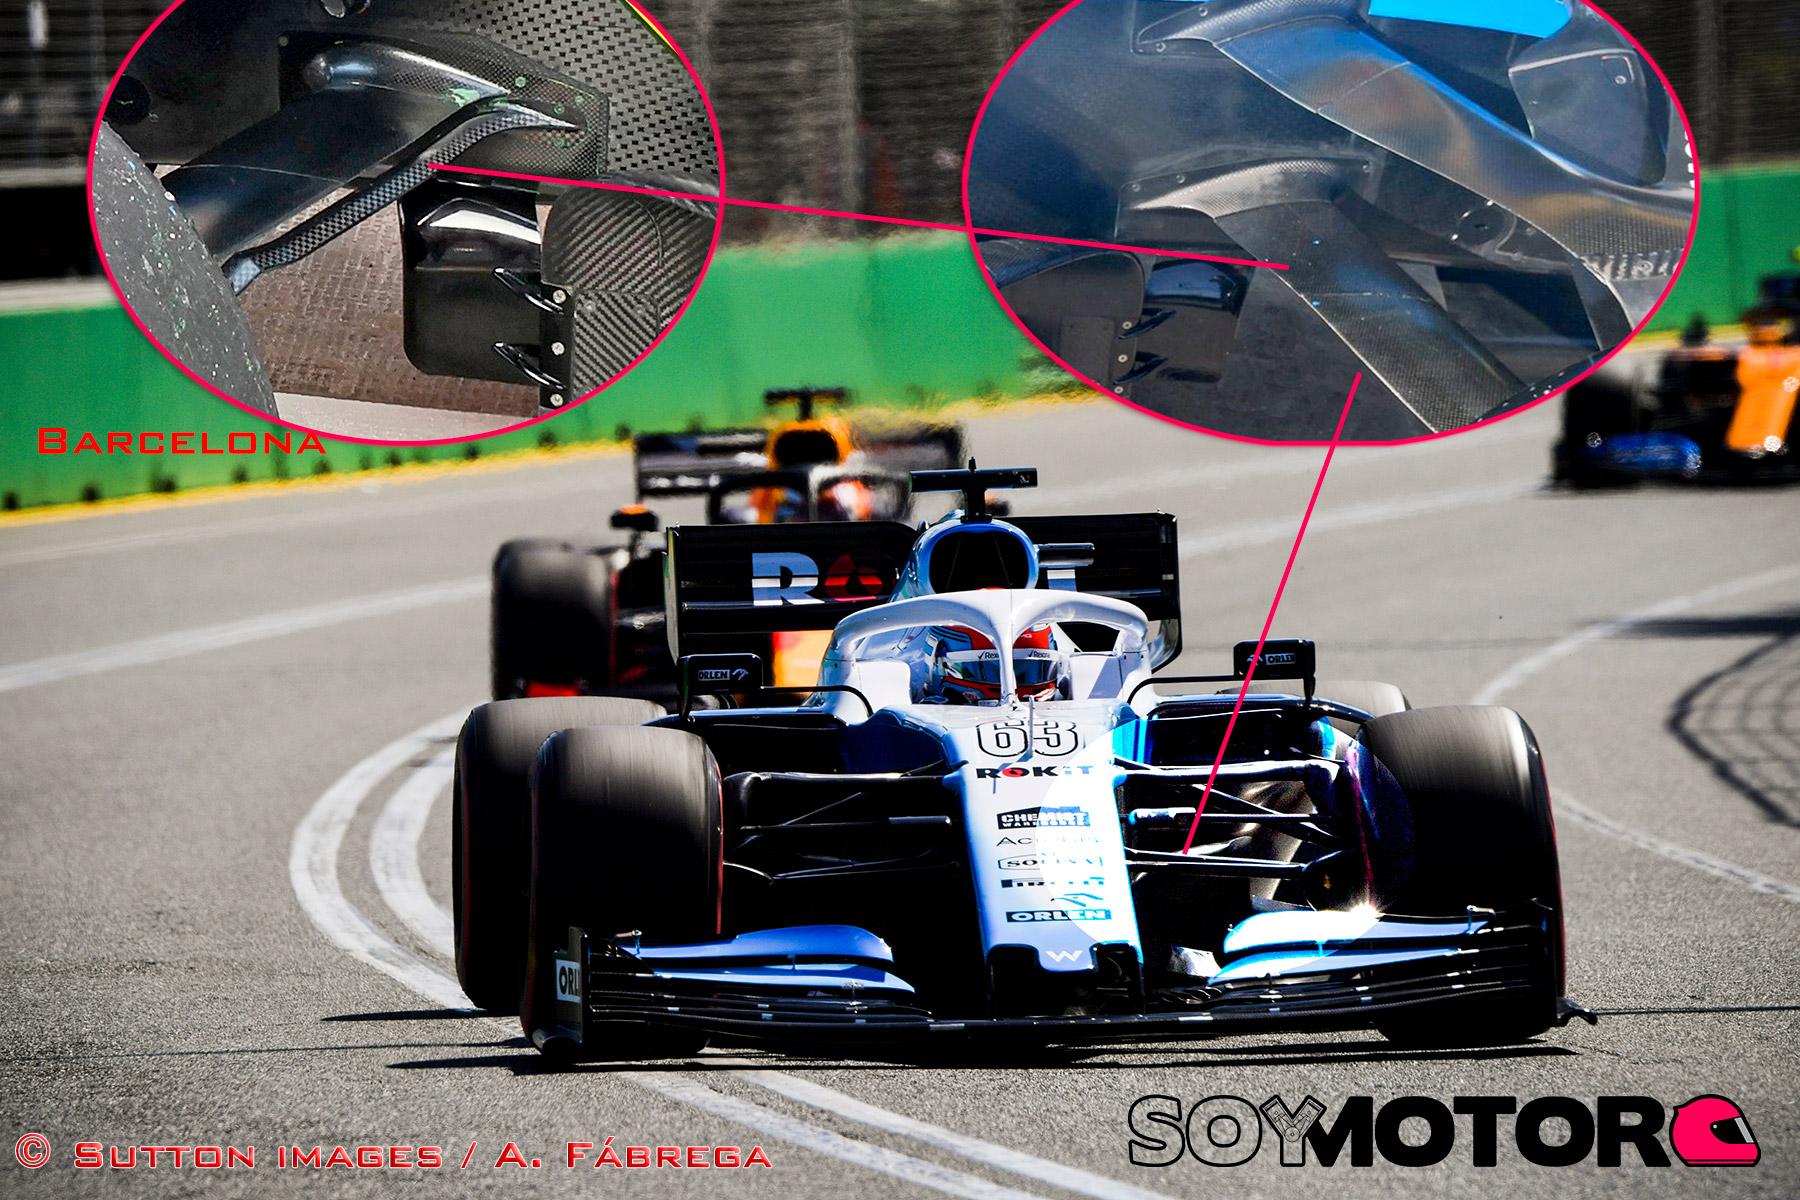 williams-suspension-delantera-soymotor.jpg